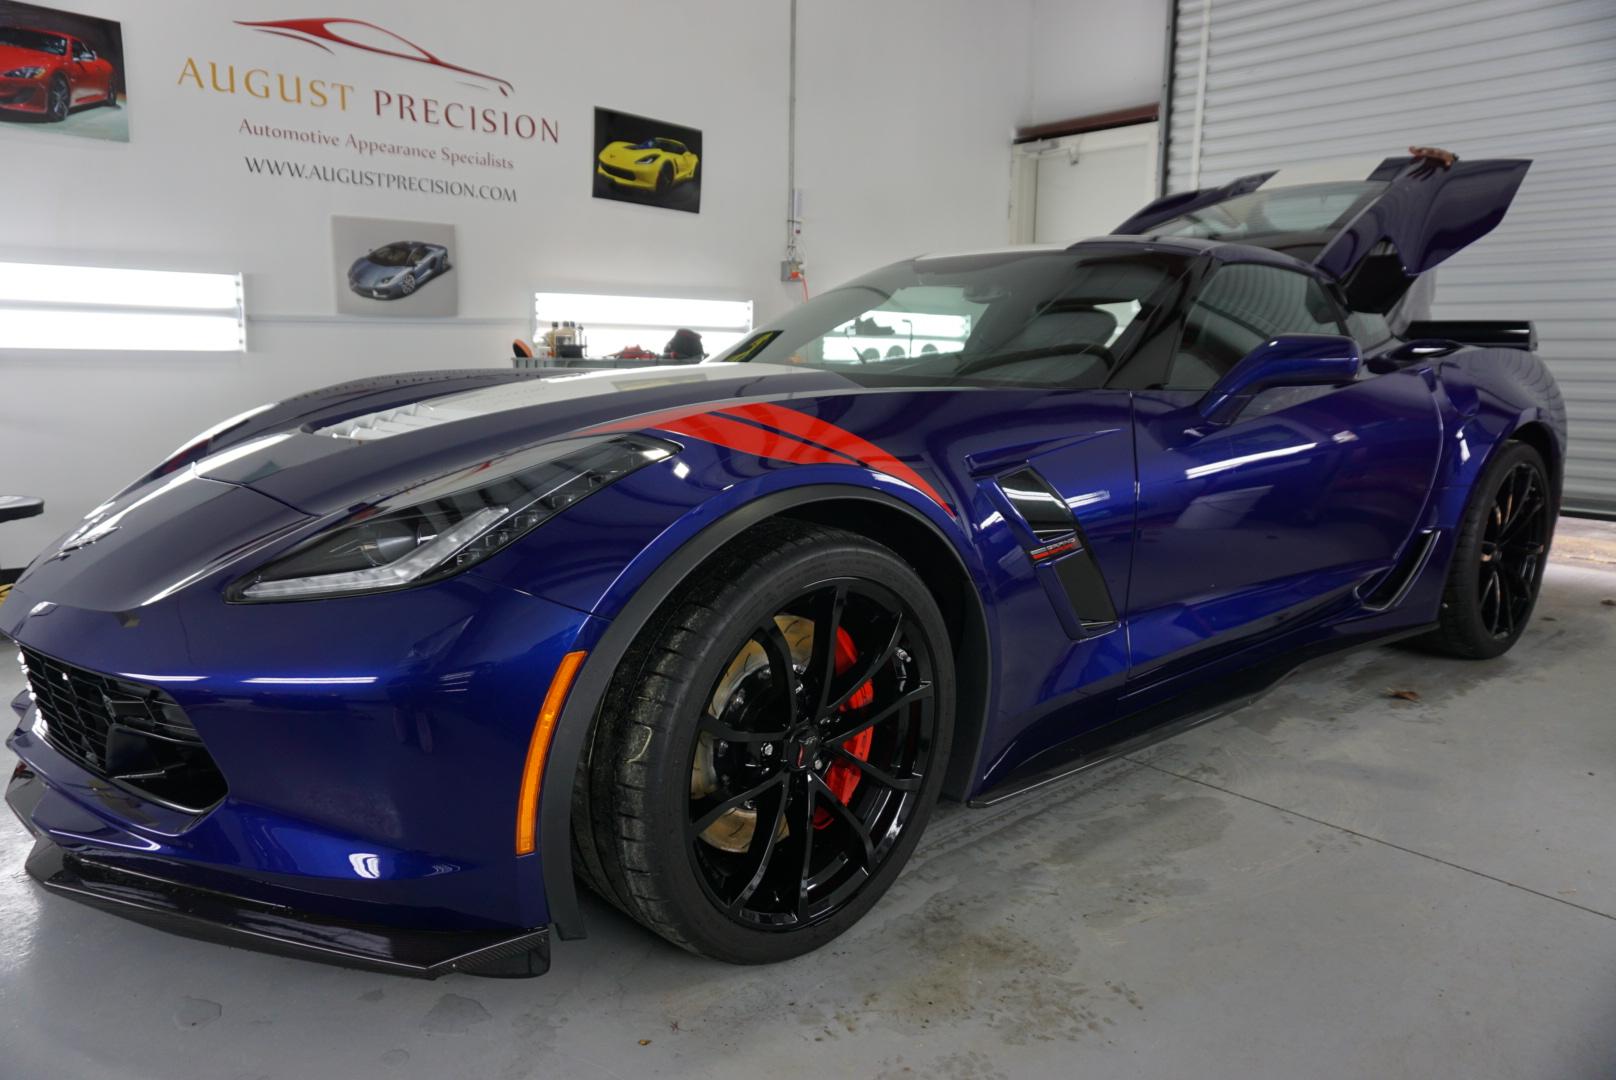 New Car Preparation Package of 2017 Chevrolet Corvette